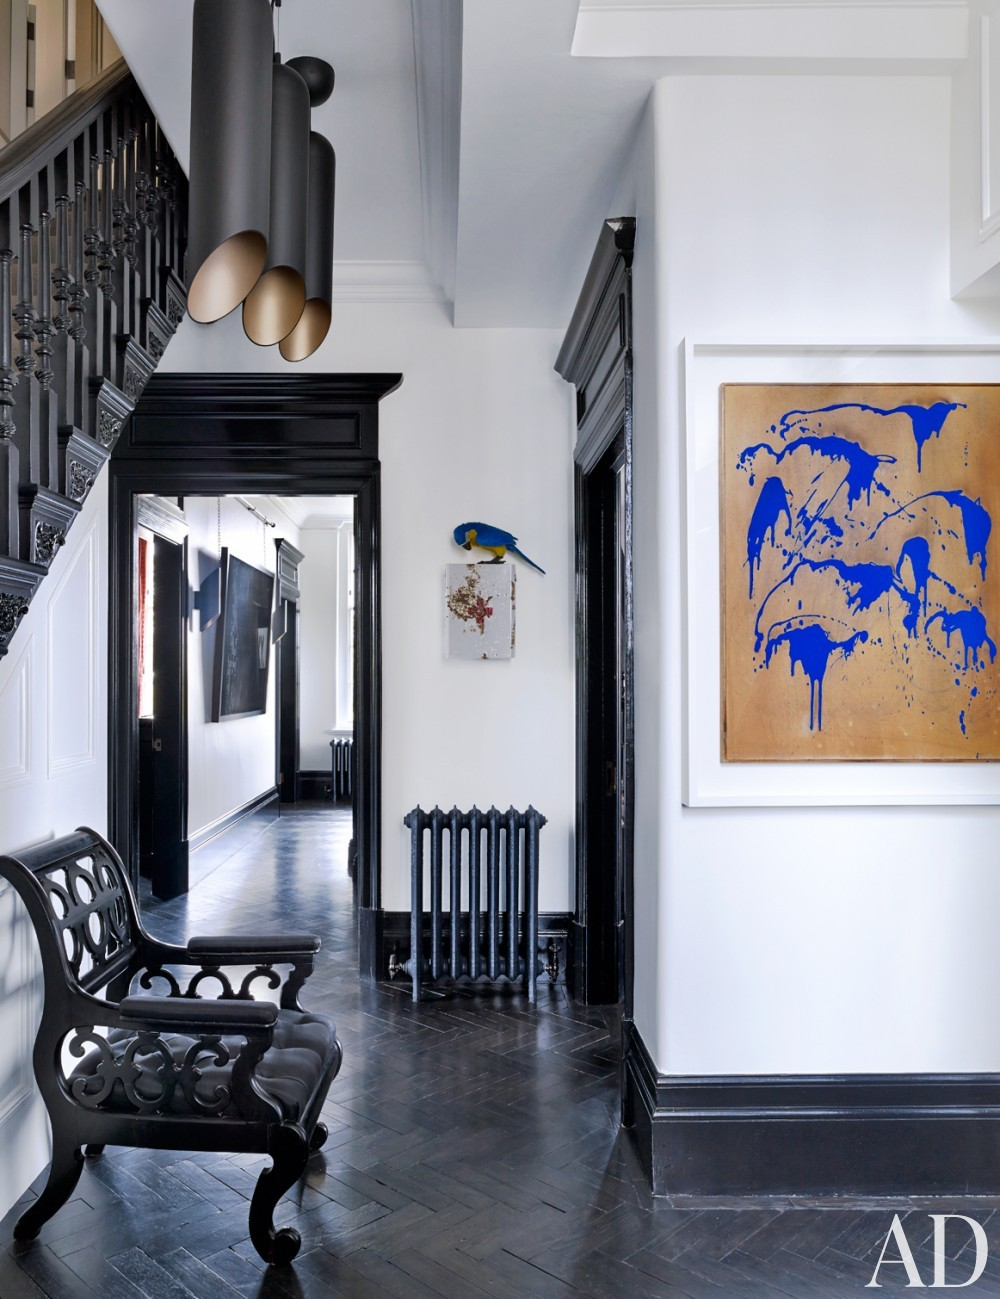 Modern Staircase/Hallway by Veere Grenney in London, UK